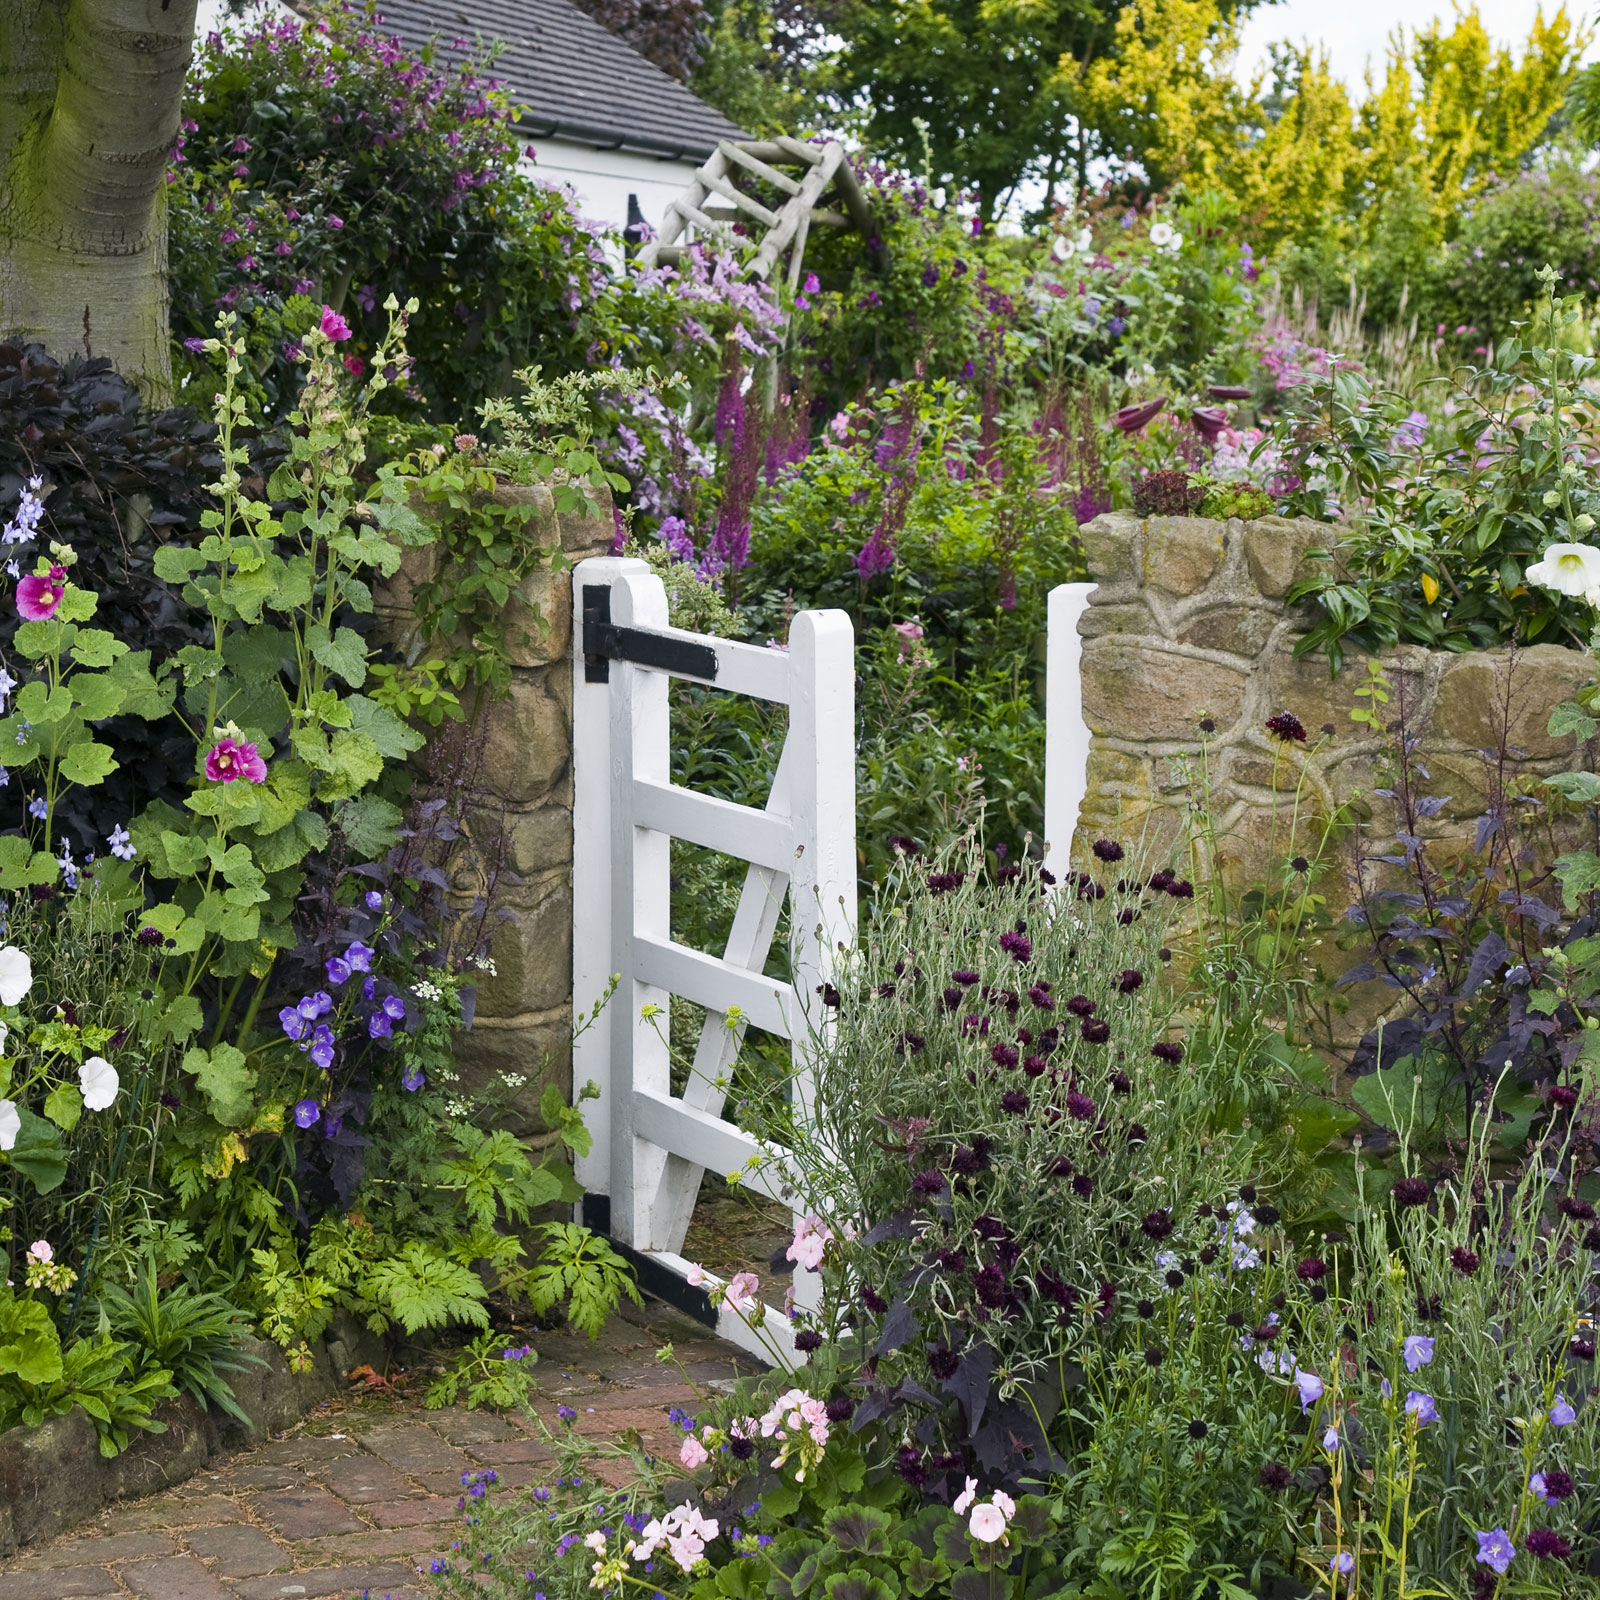 9 Cottage Style Garden Ideas - Gardening Ideas on Bungalow Backyard Ideas id=88331